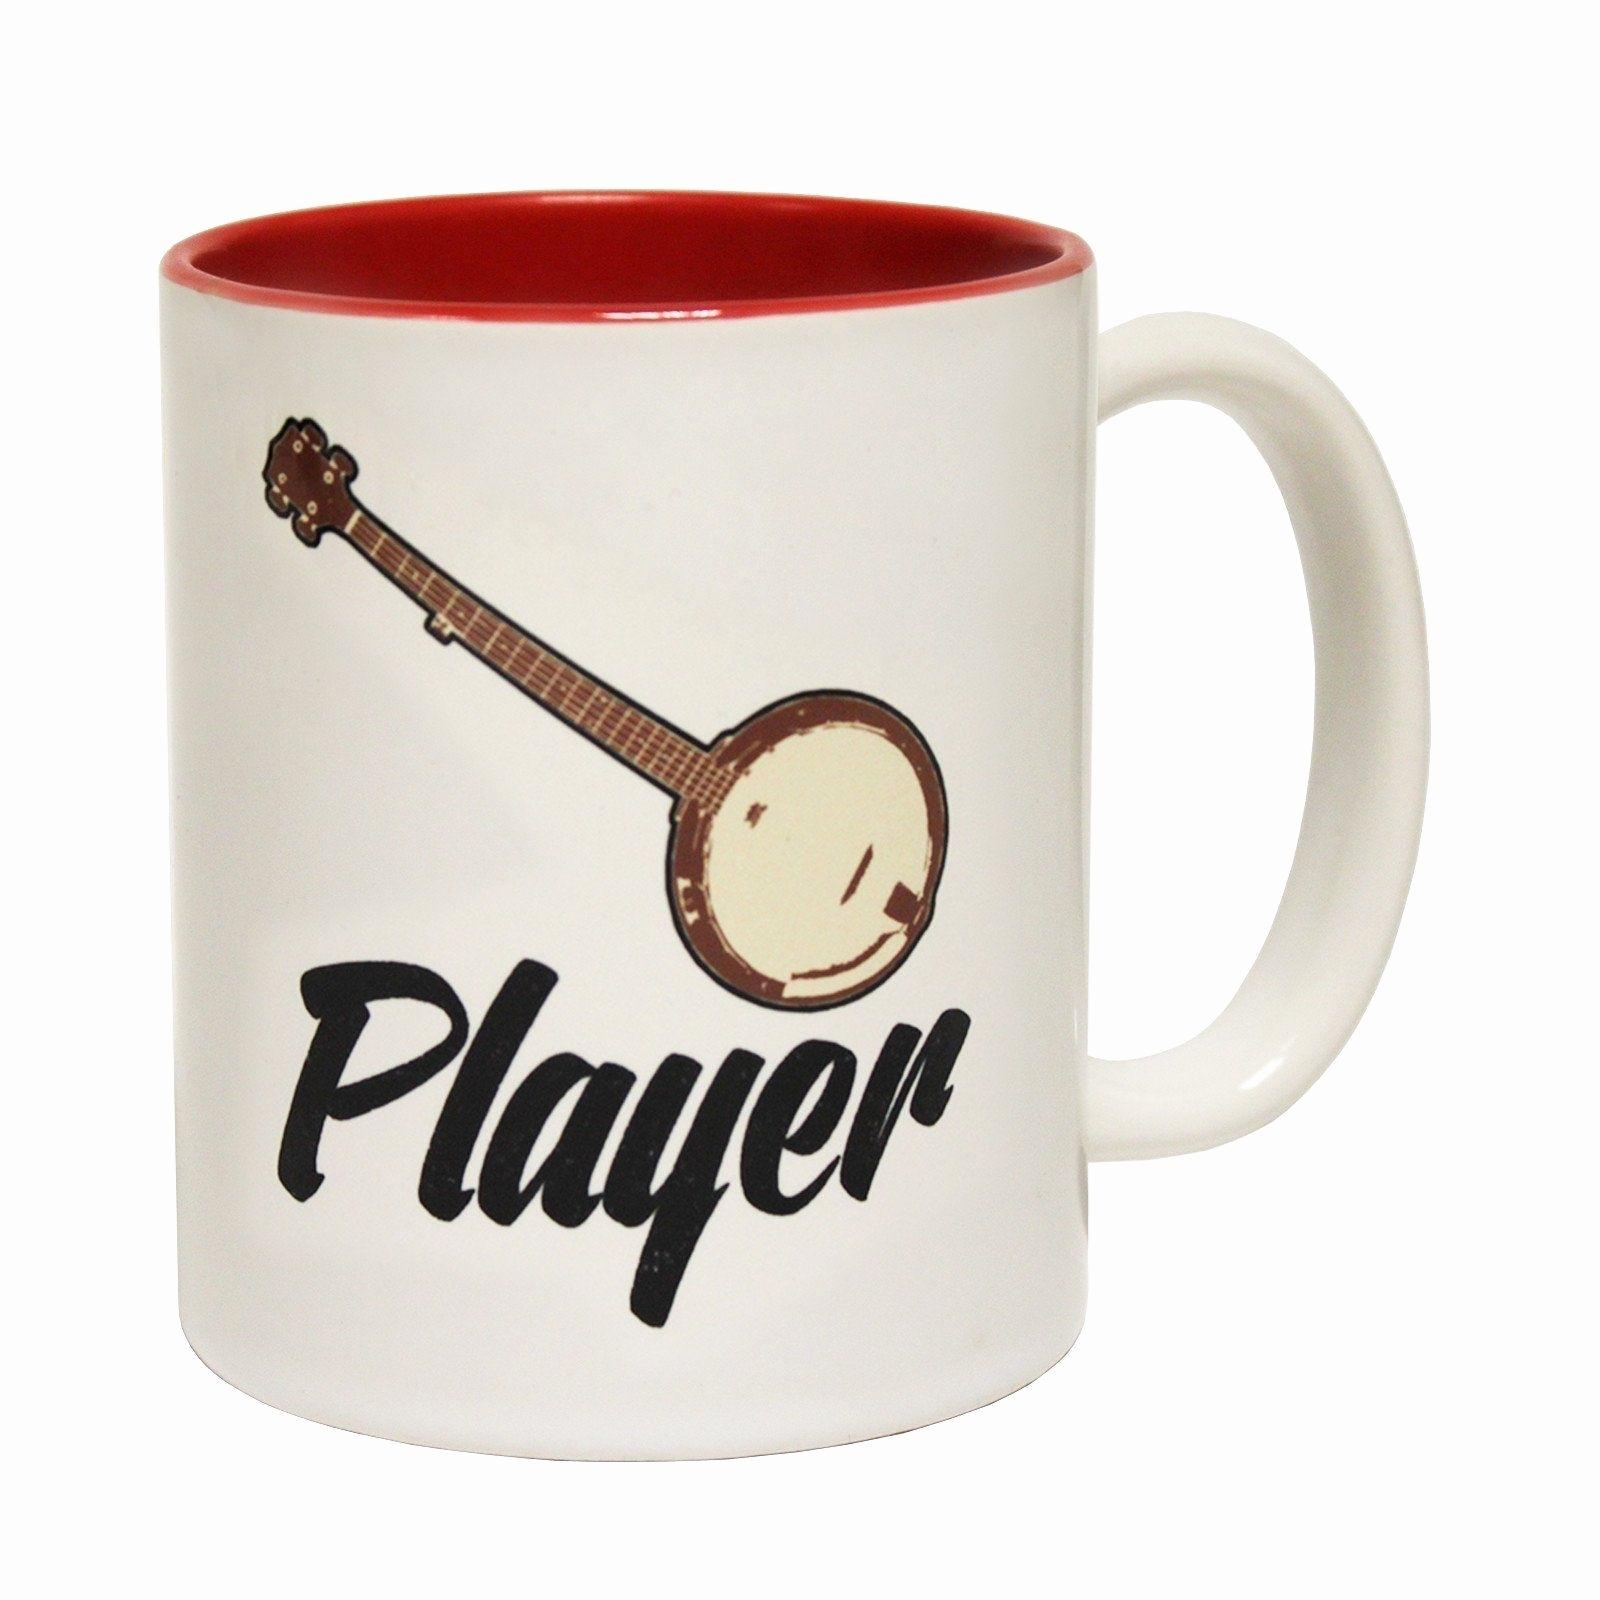 I Love Spreadsheets Mug Luxury Funny Mugs Banned Member Banjo Player With Spreadsheet Mug